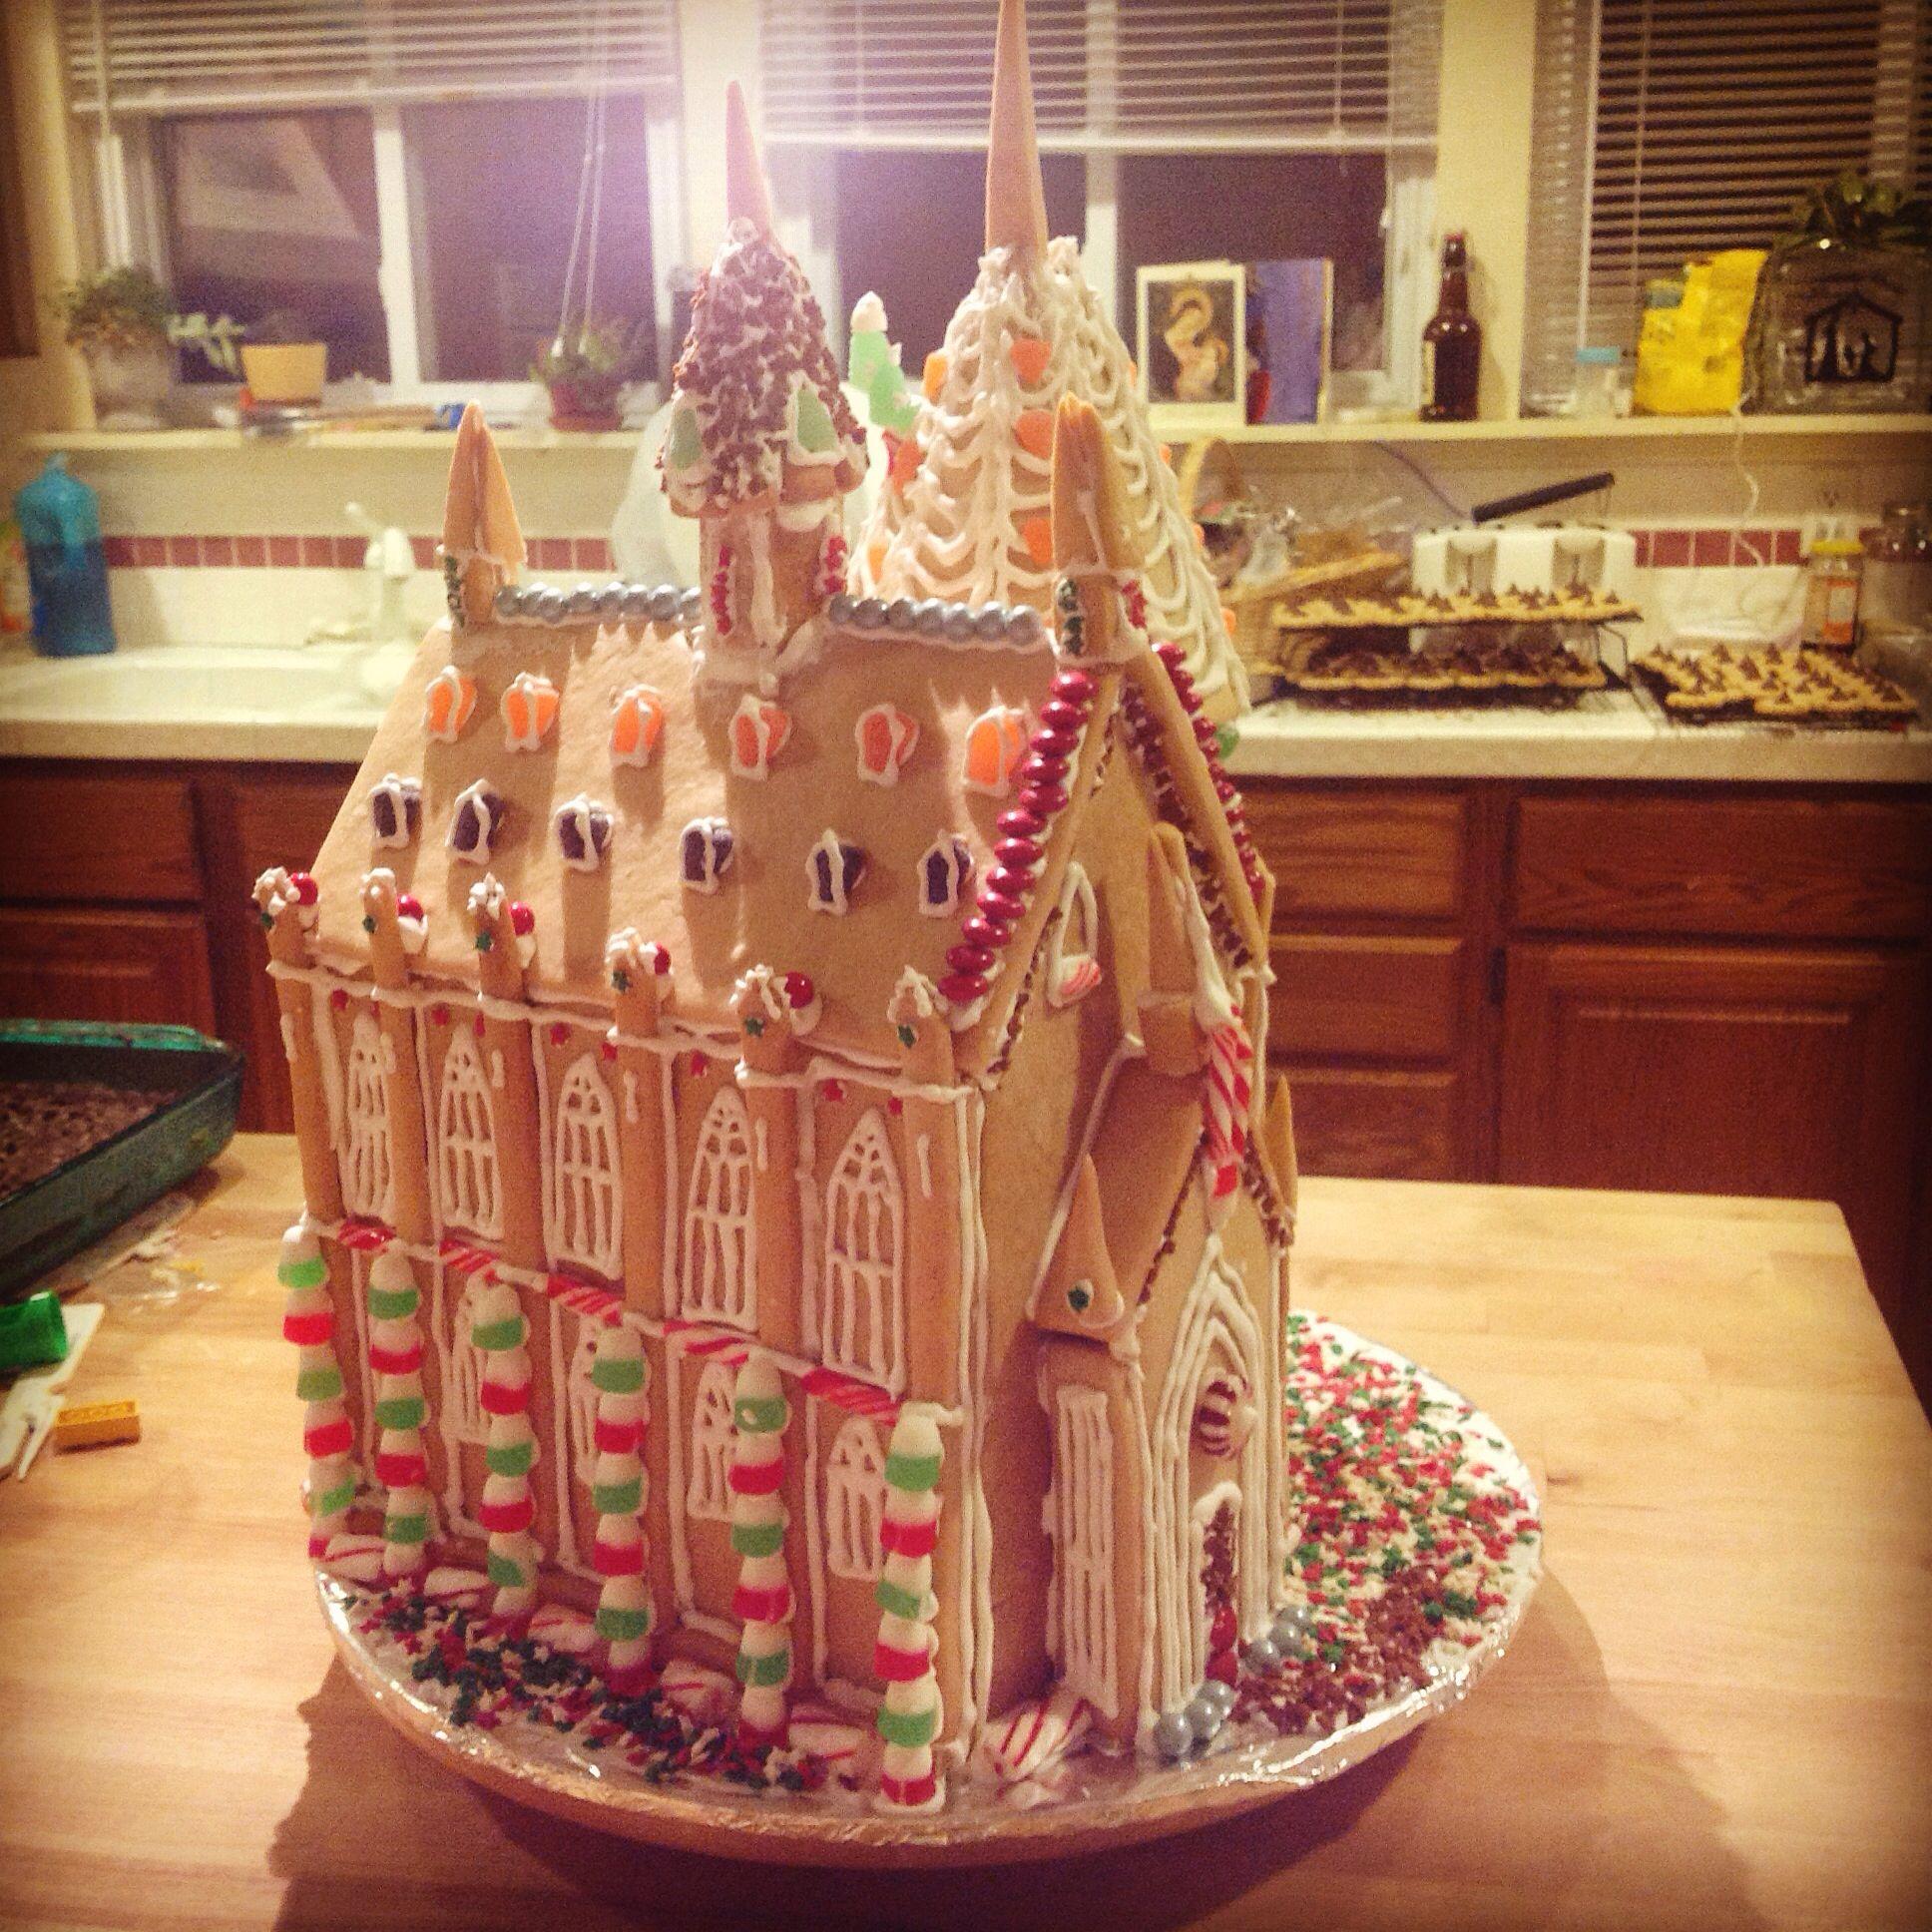 hogwarts gingerbread house template  Hogwarts gingerbread house. | Christmas gingerbread house ...